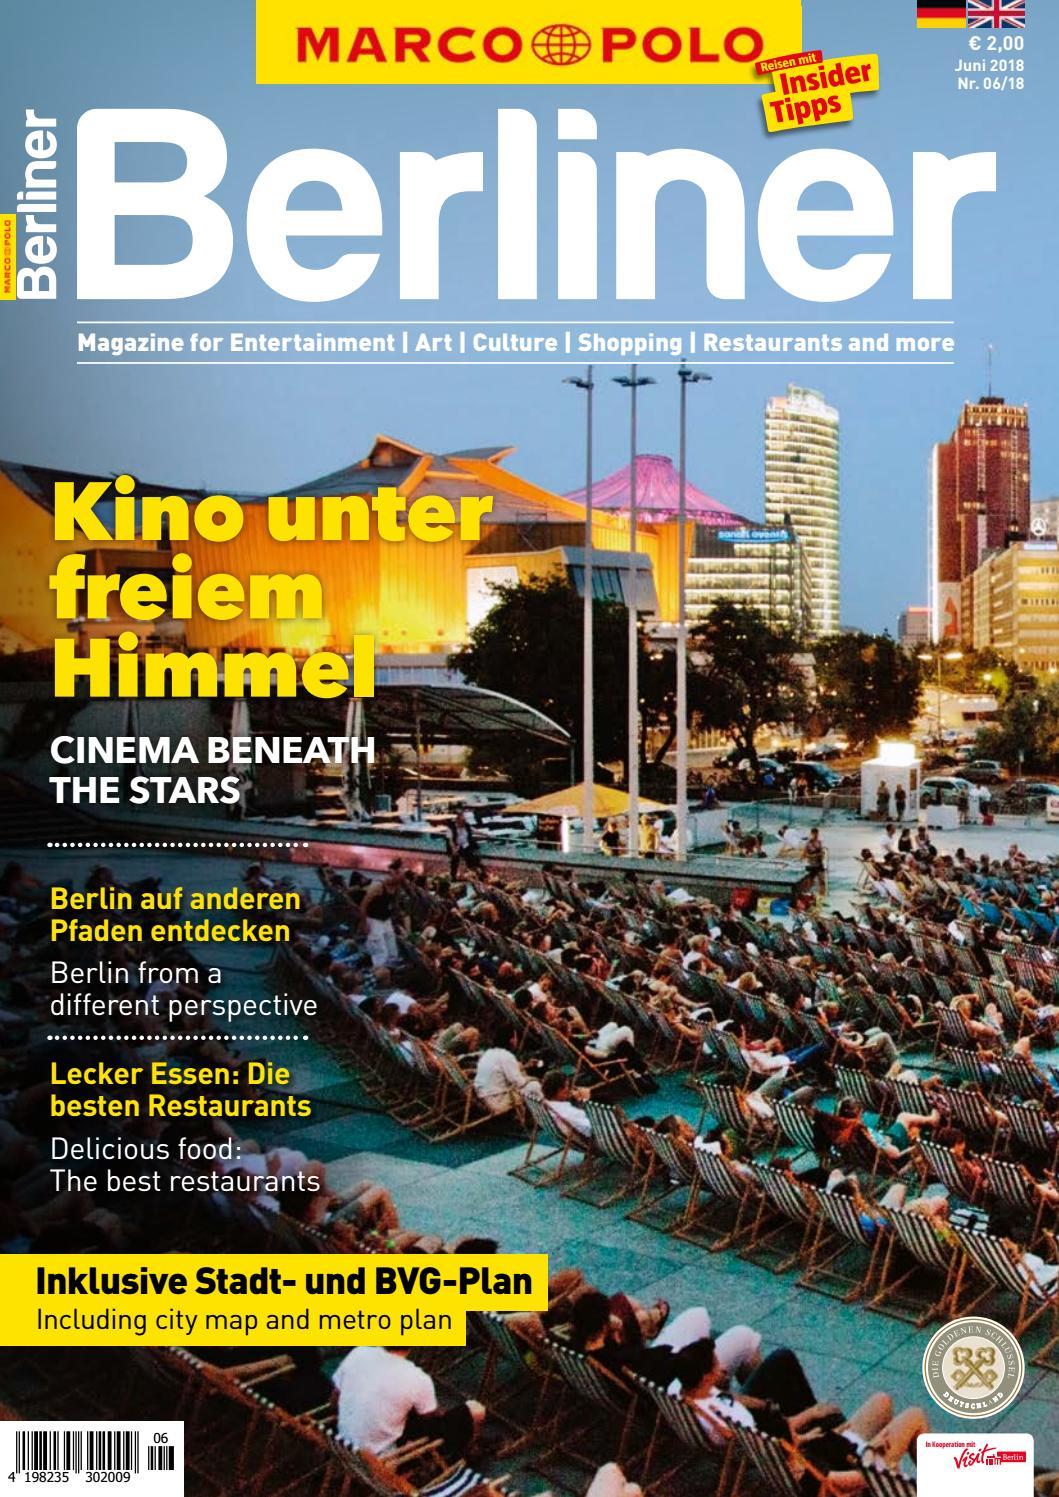 Marco Polo Berliner #06/2018 by Berlin Medien GmbH - issuu